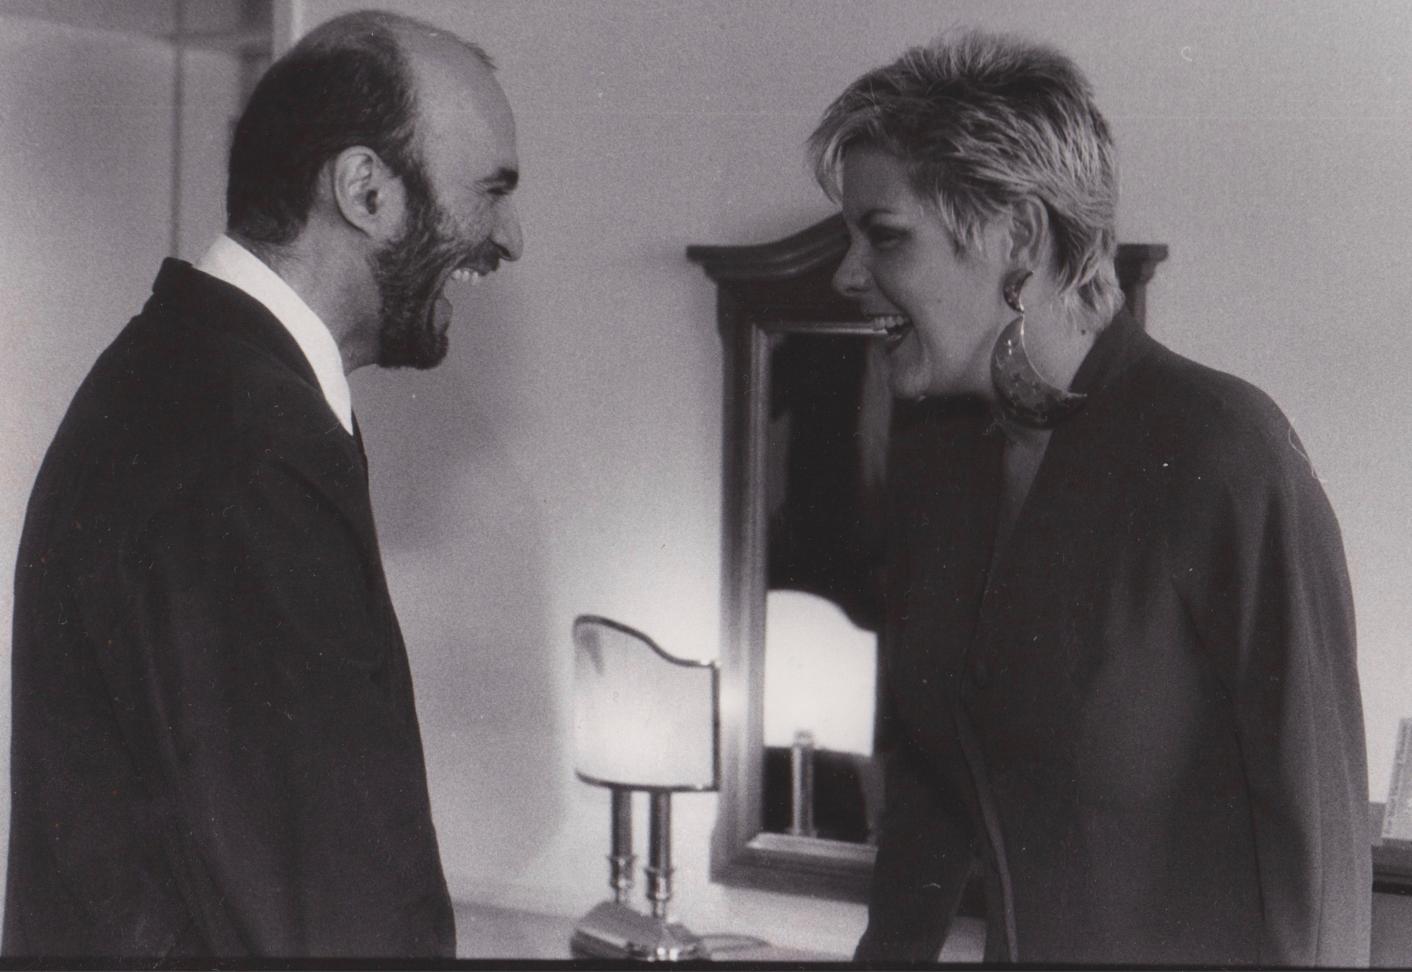 Ruth McCartney and Nasim Nadirov in Russia circa 1991